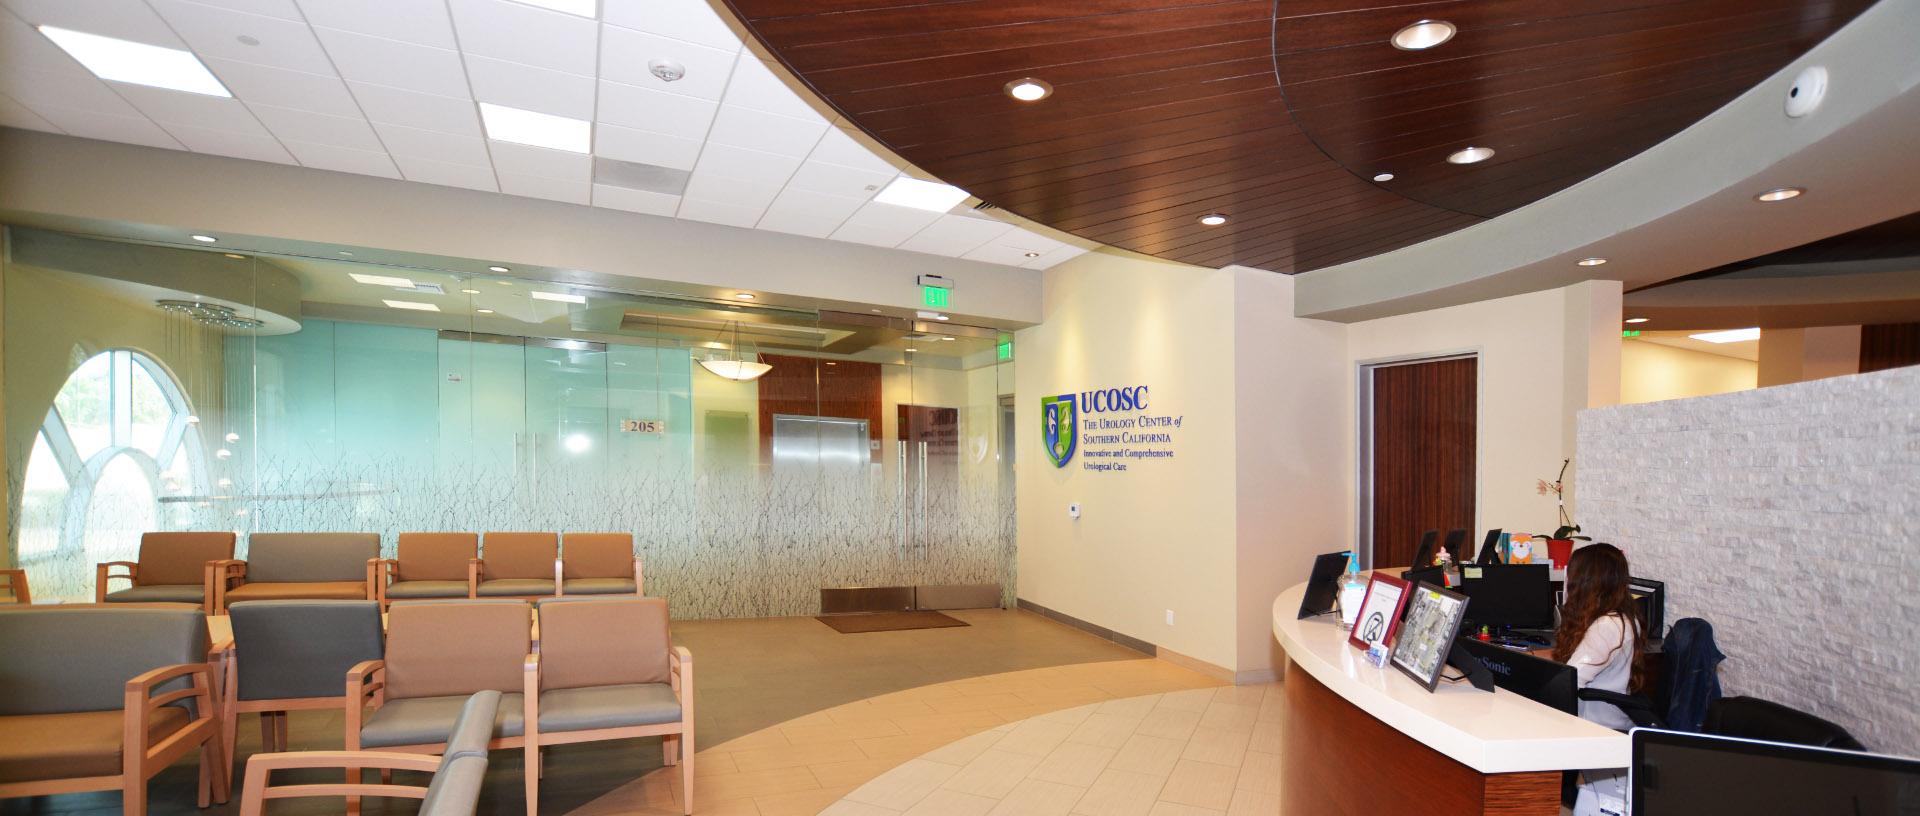 Urology Center of Southern California, Urological Services